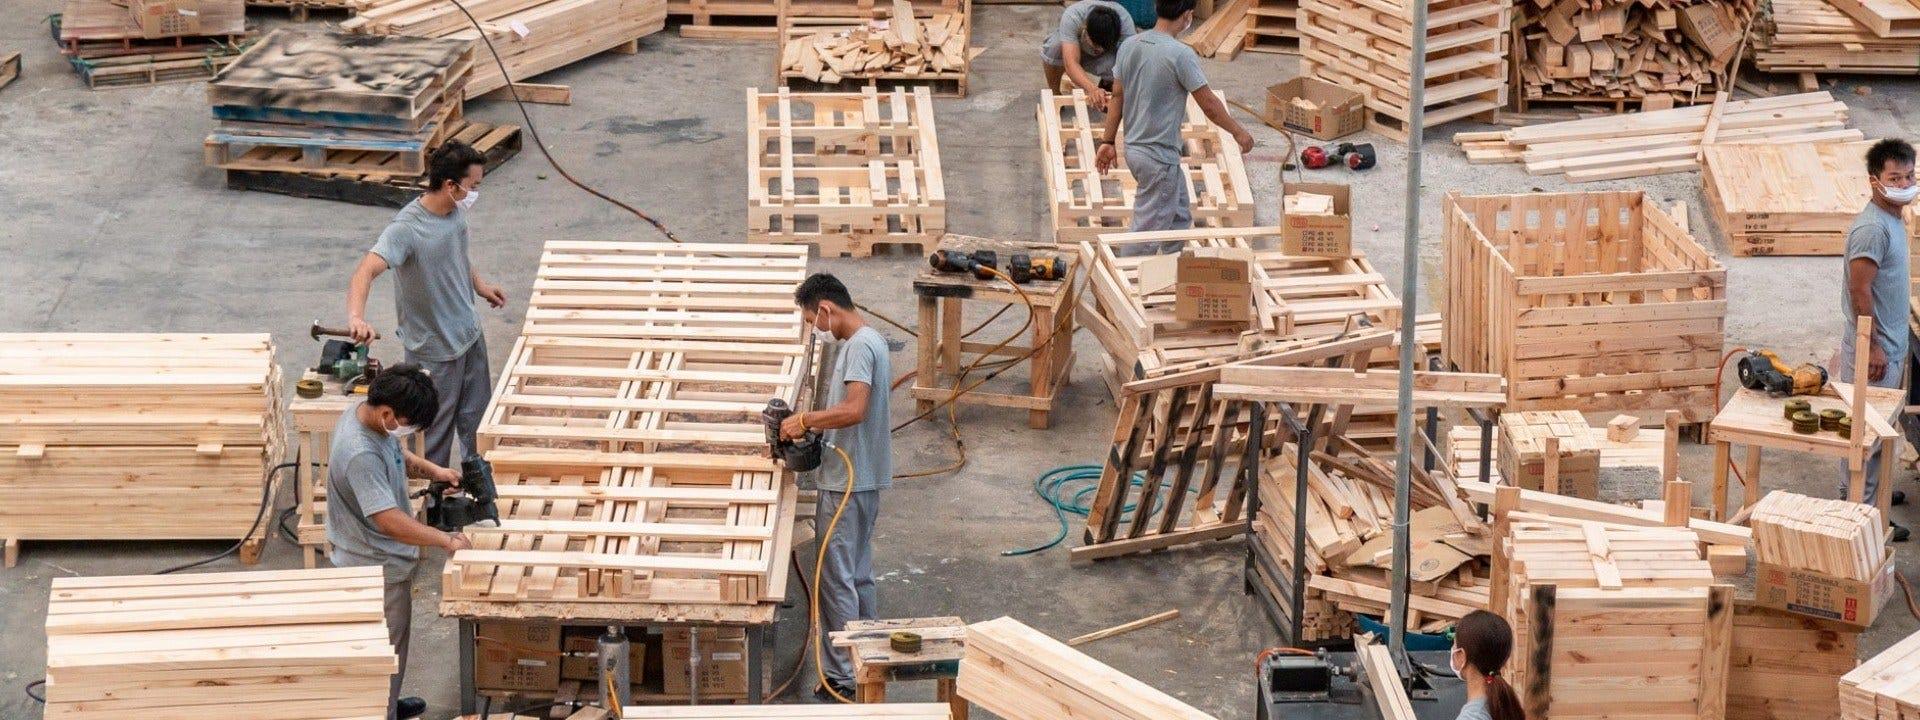 Pallet Maker Group Co. , Tailanda